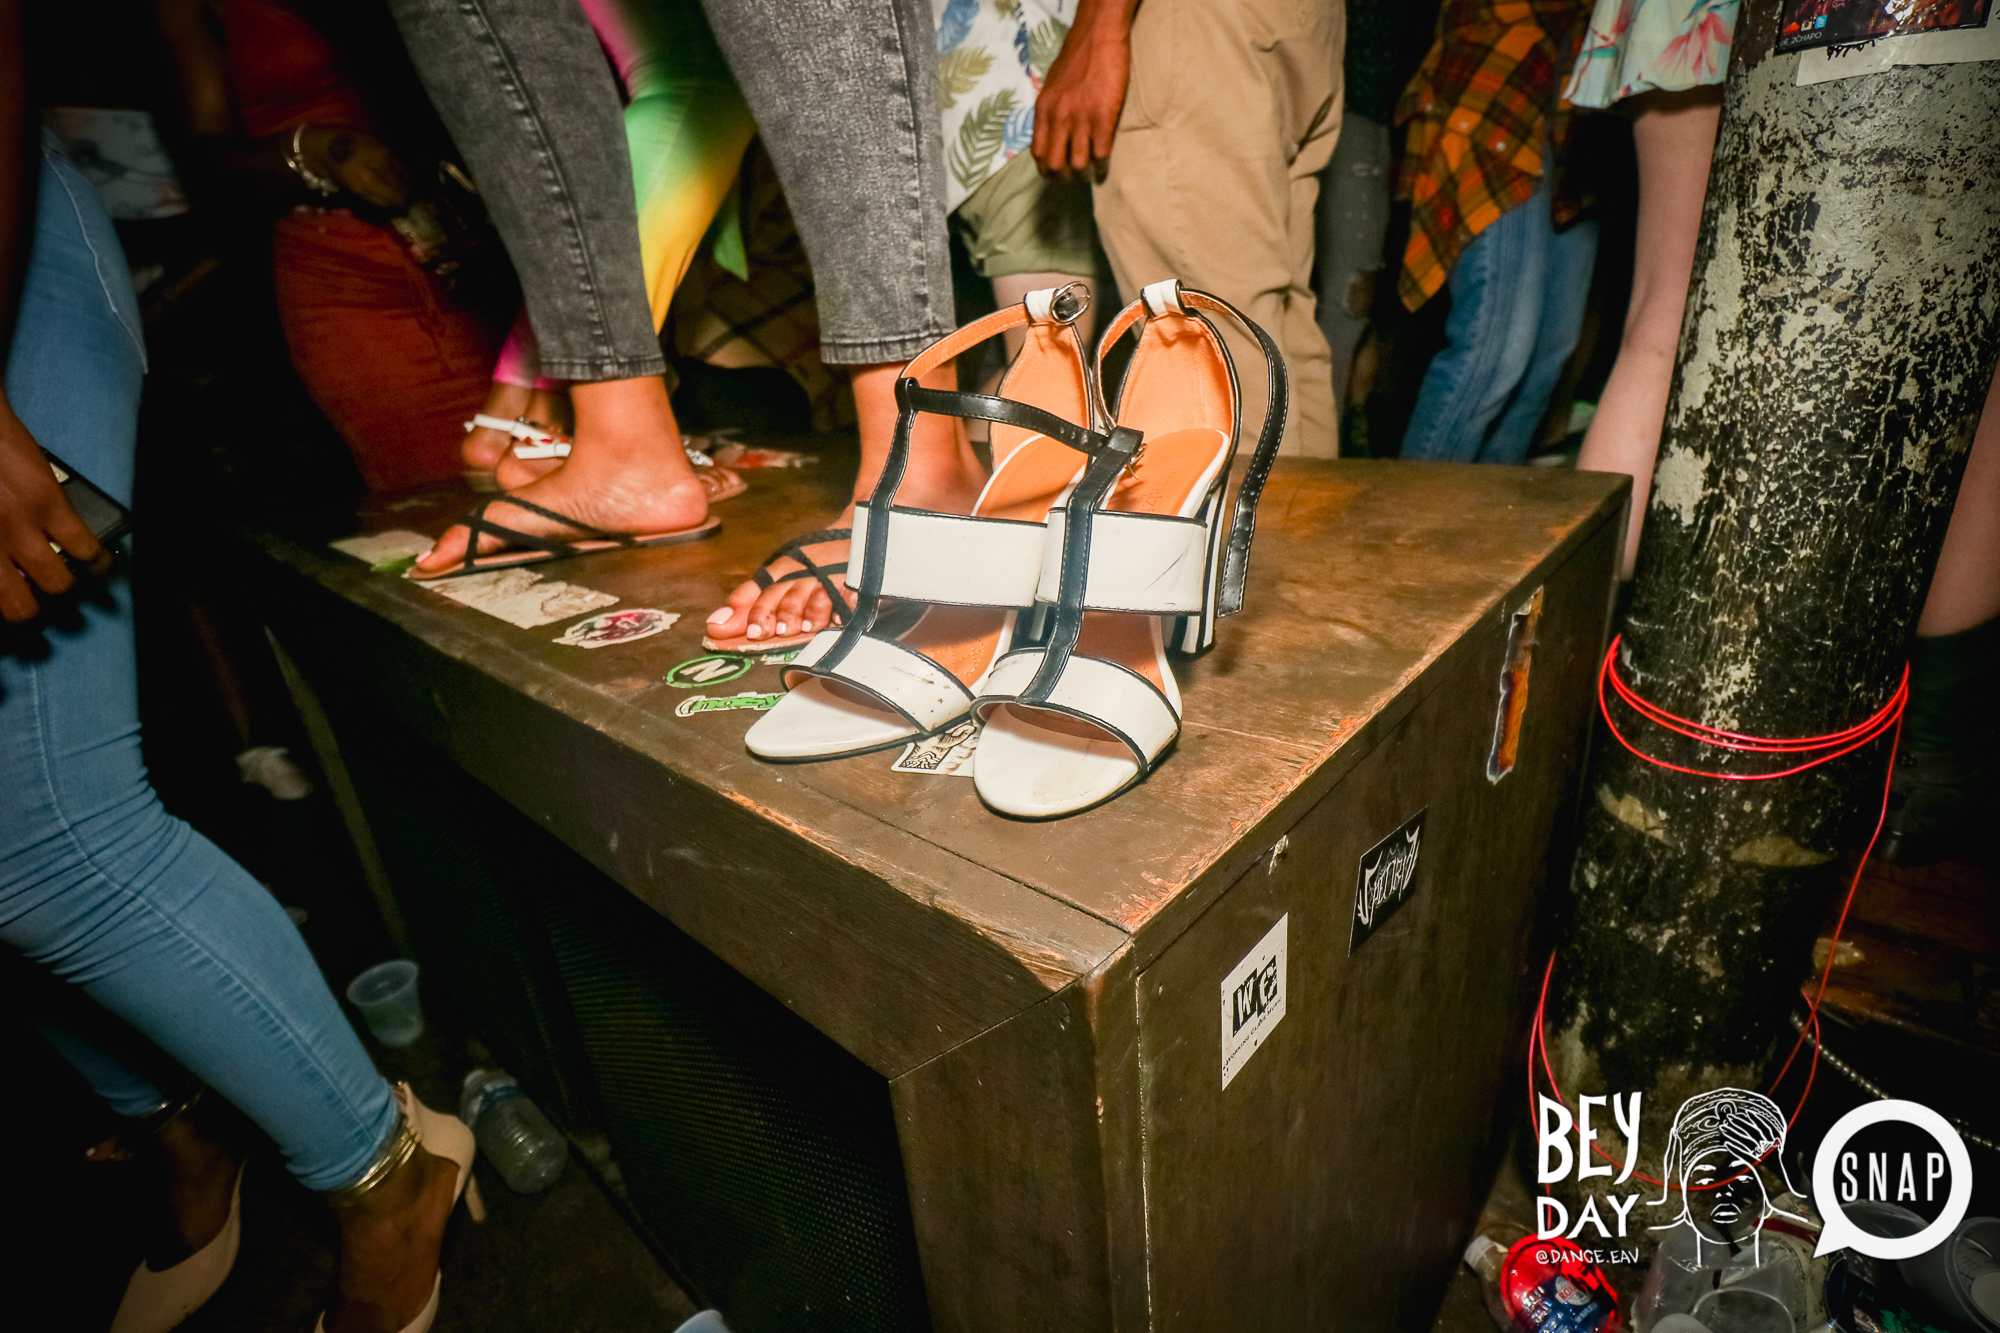 157Bey Day Grace Kelly The Basement Atlanta Oh Snap Kid.jpg